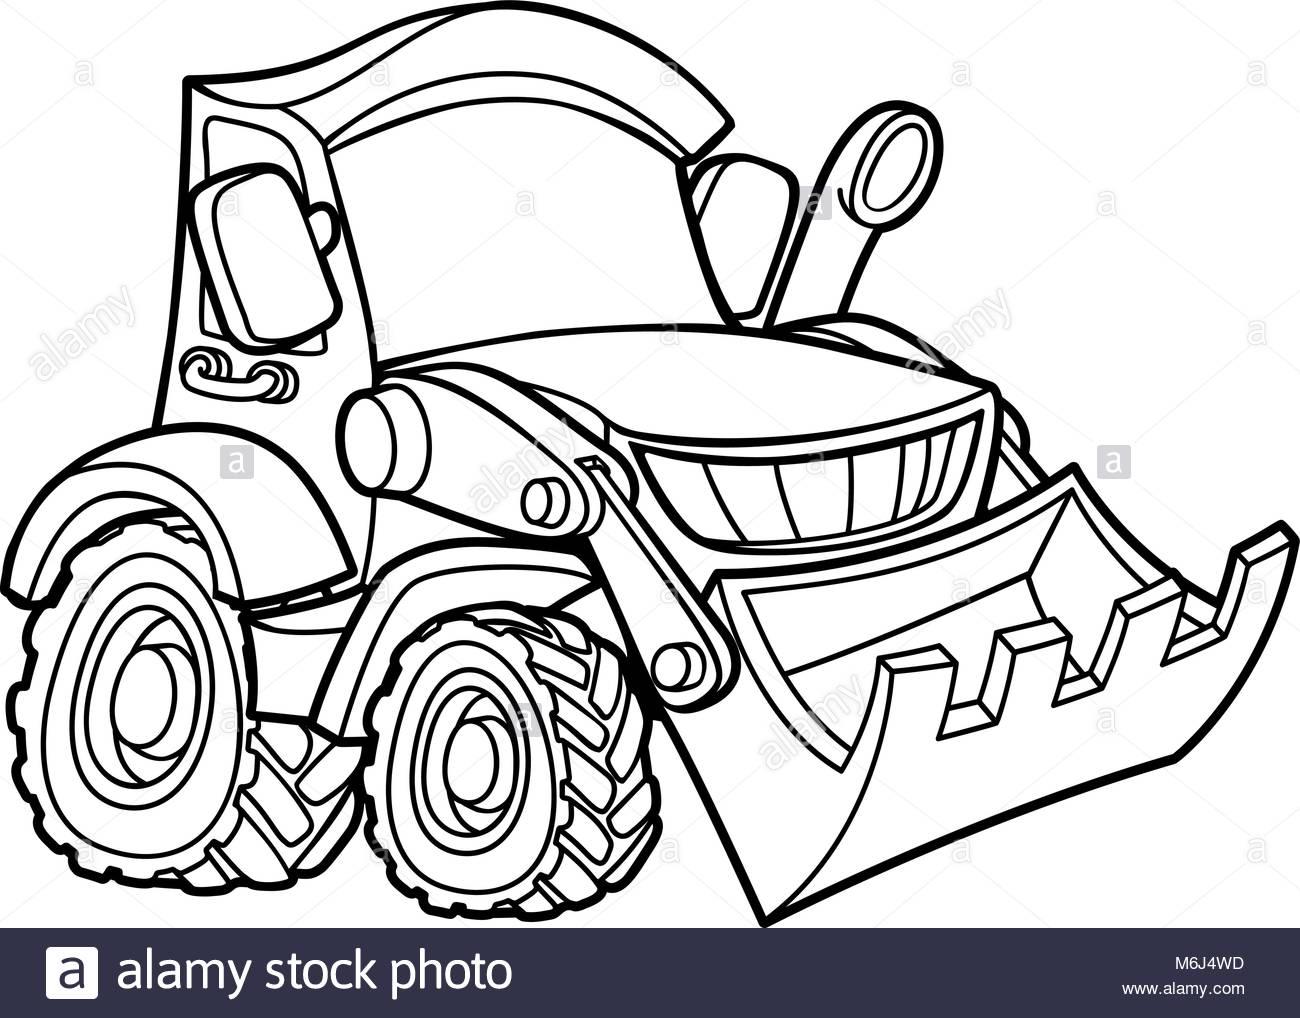 1300x1018 Bulldozer Black And White Stock Photos Amp Images